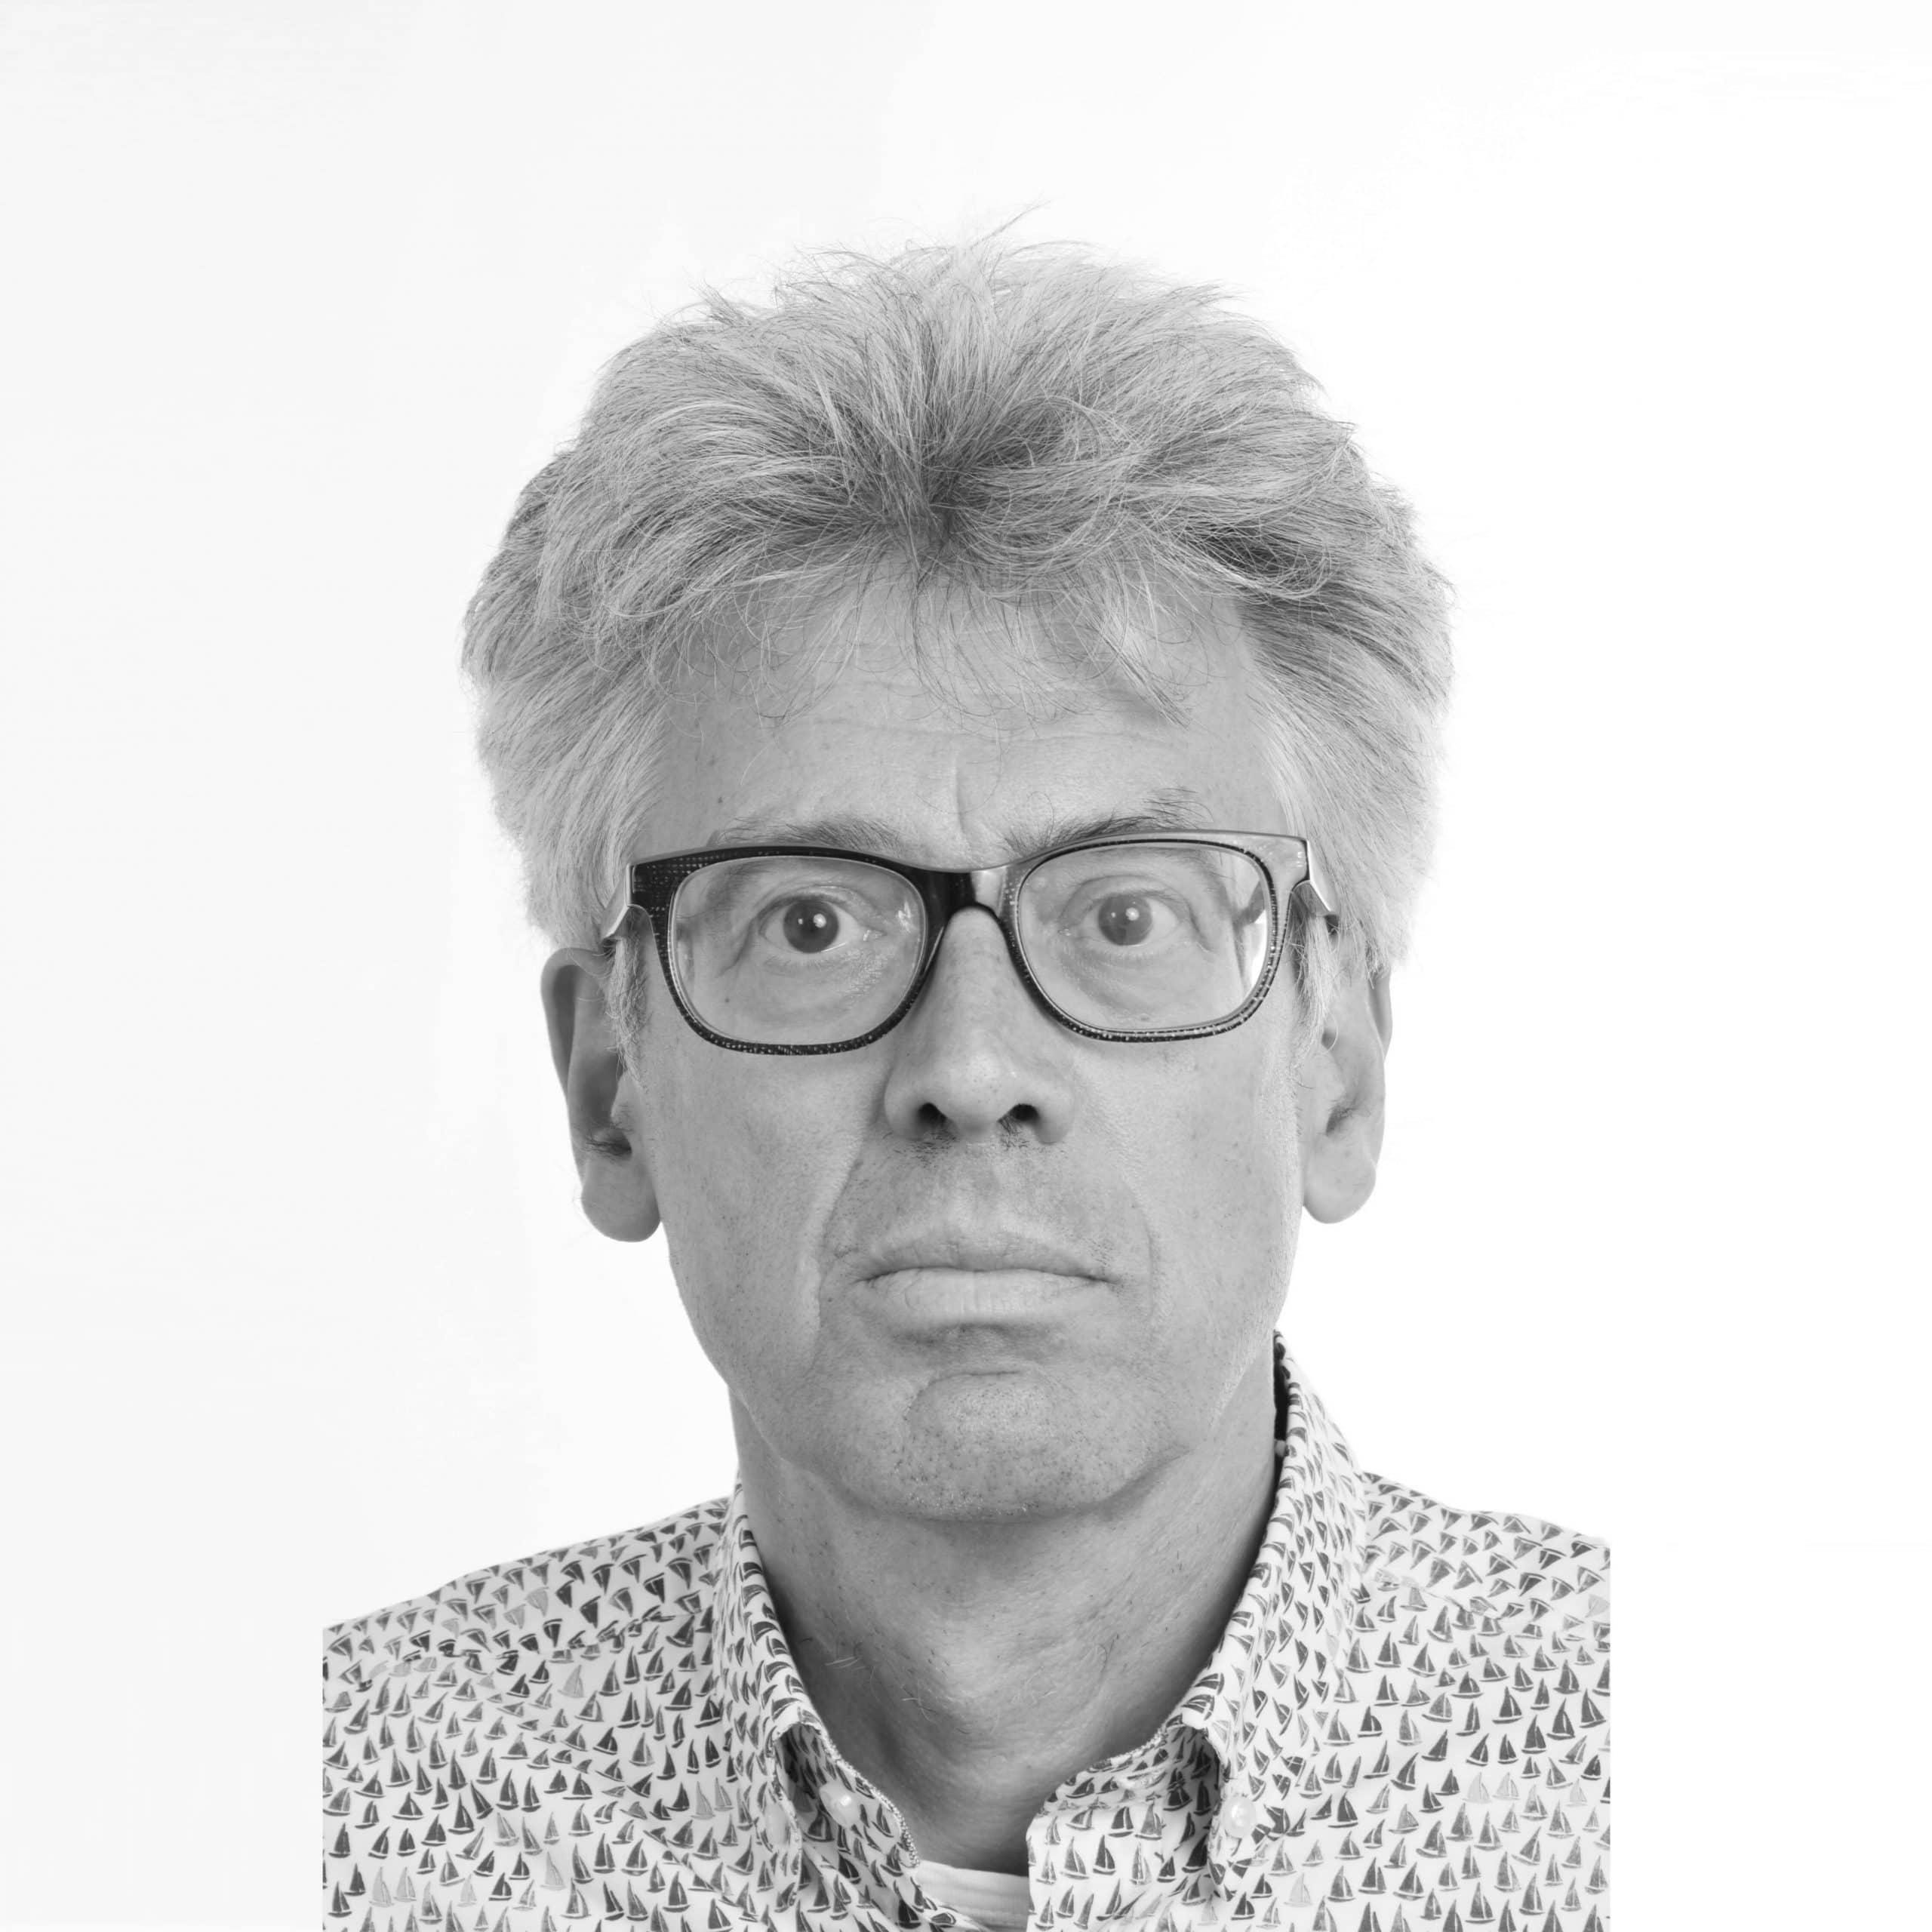 Paul Teeuwen